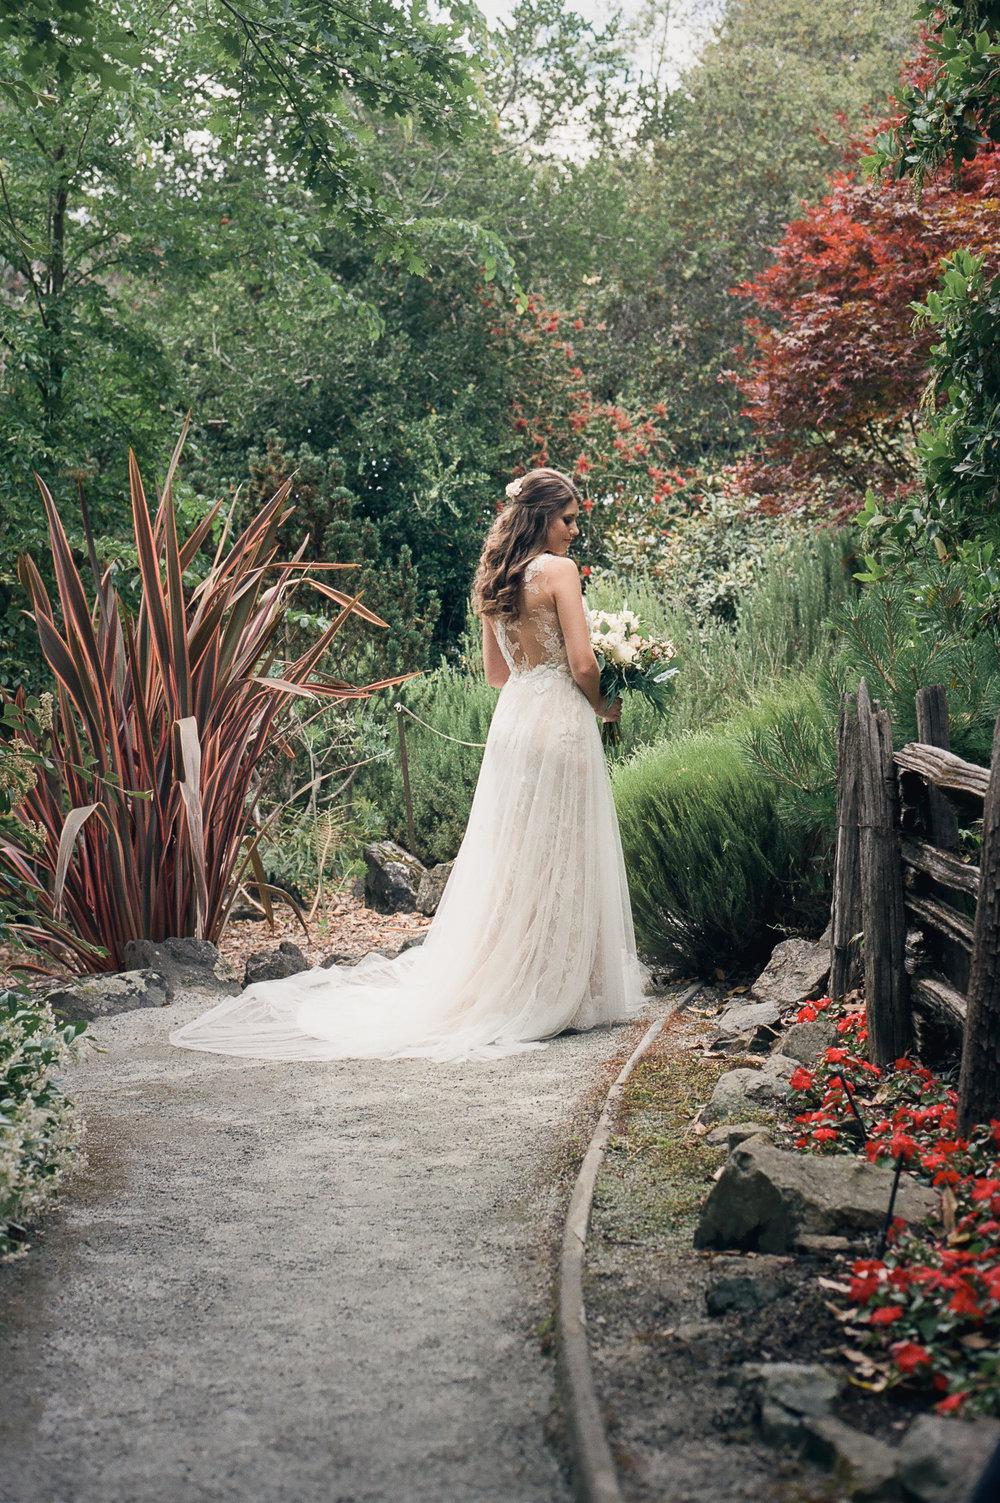 35mm-film-Michael-Megan-Wedding-Napa-2017-PRINT-006.jpg